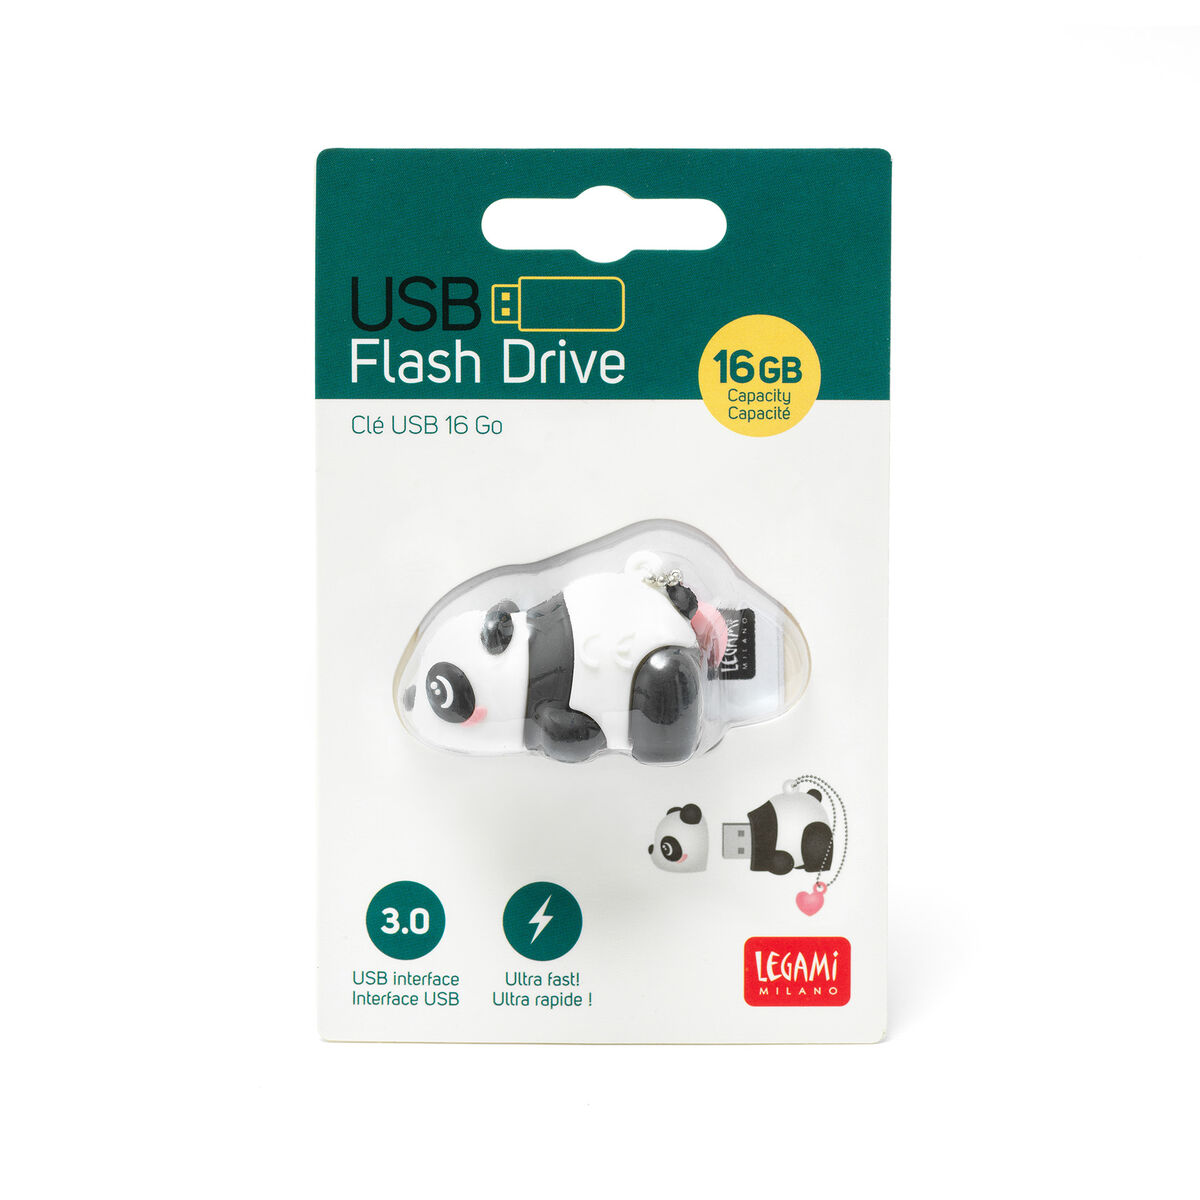 3.0 USB Flash Drive - 16 GB, , zoo